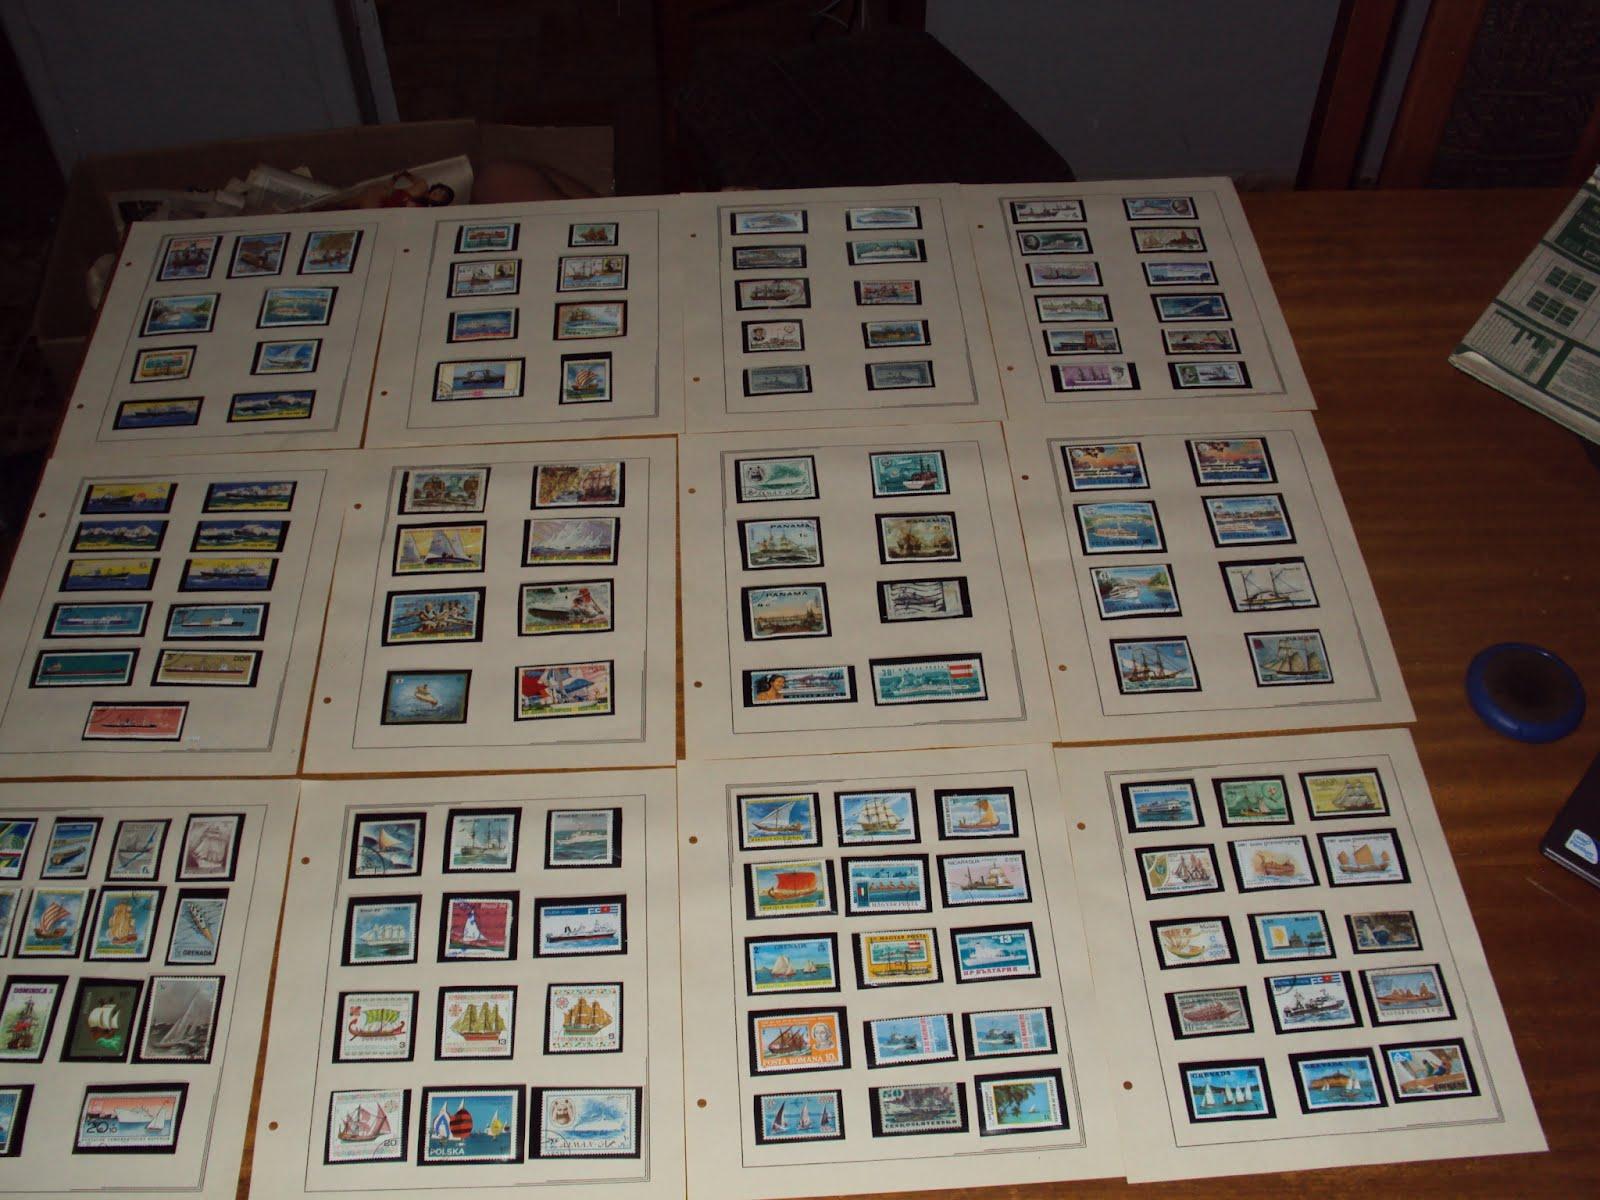 papeis+de+carta+e+selos+028.JPG (1600×1200)